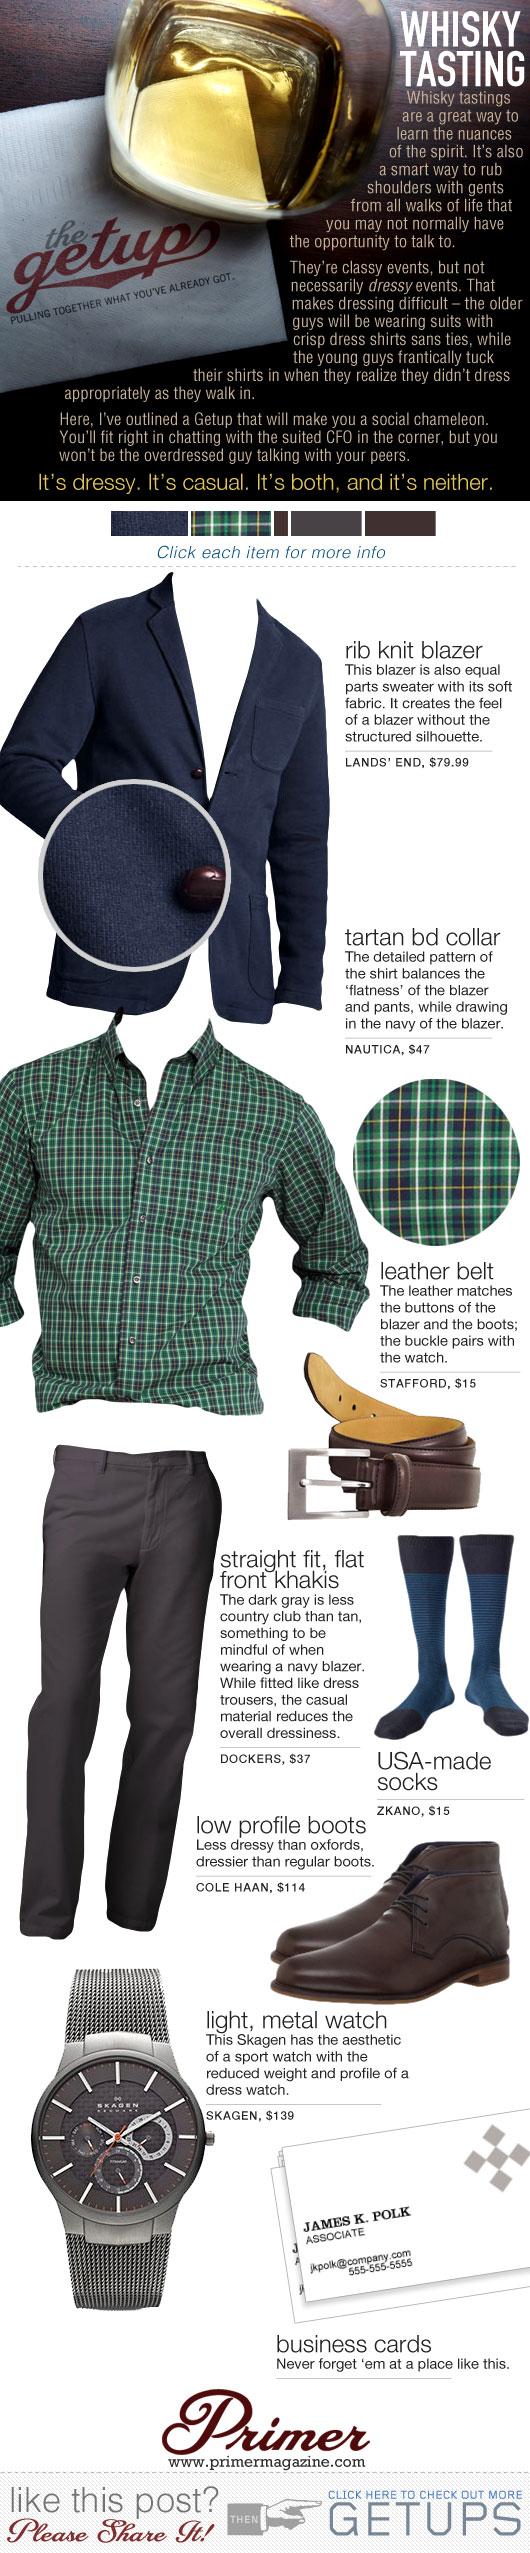 Getup Whiskey Tasting - Blue blazer, green check shirt, gray pants, brown boots